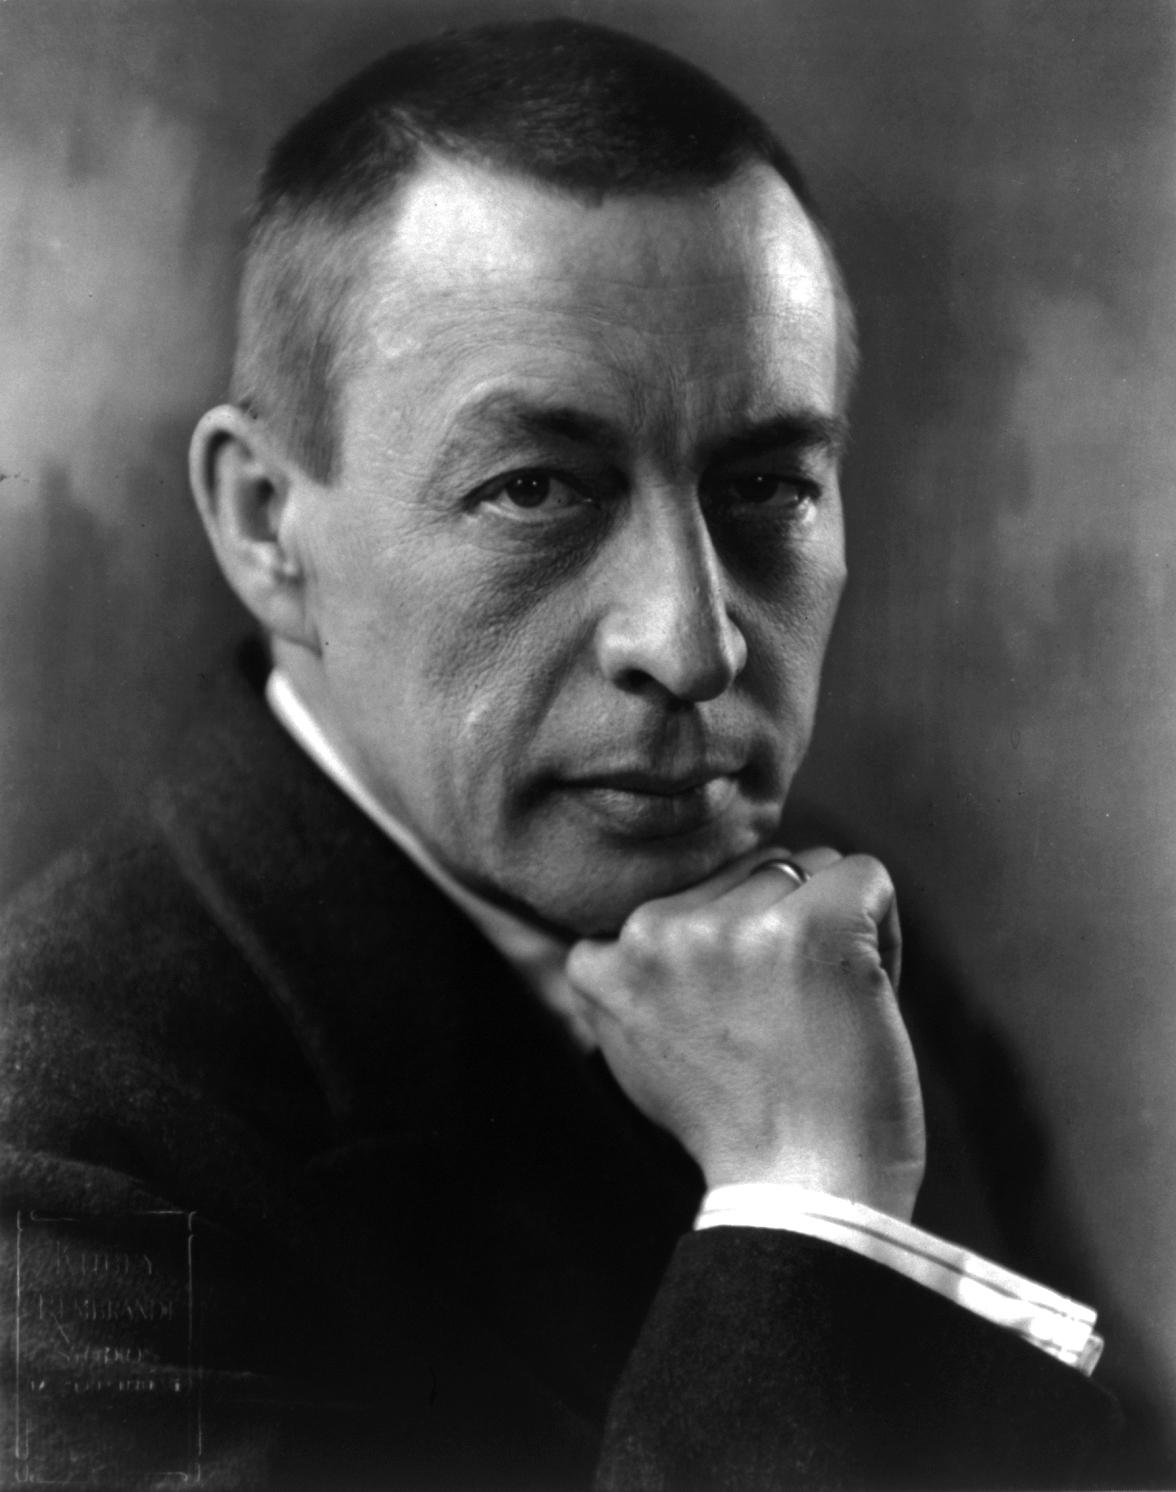 https://kksonorus.se/wp-content/uploads/2018/01/Sergei_Rachmaninoff_cph.3a40575.jpg